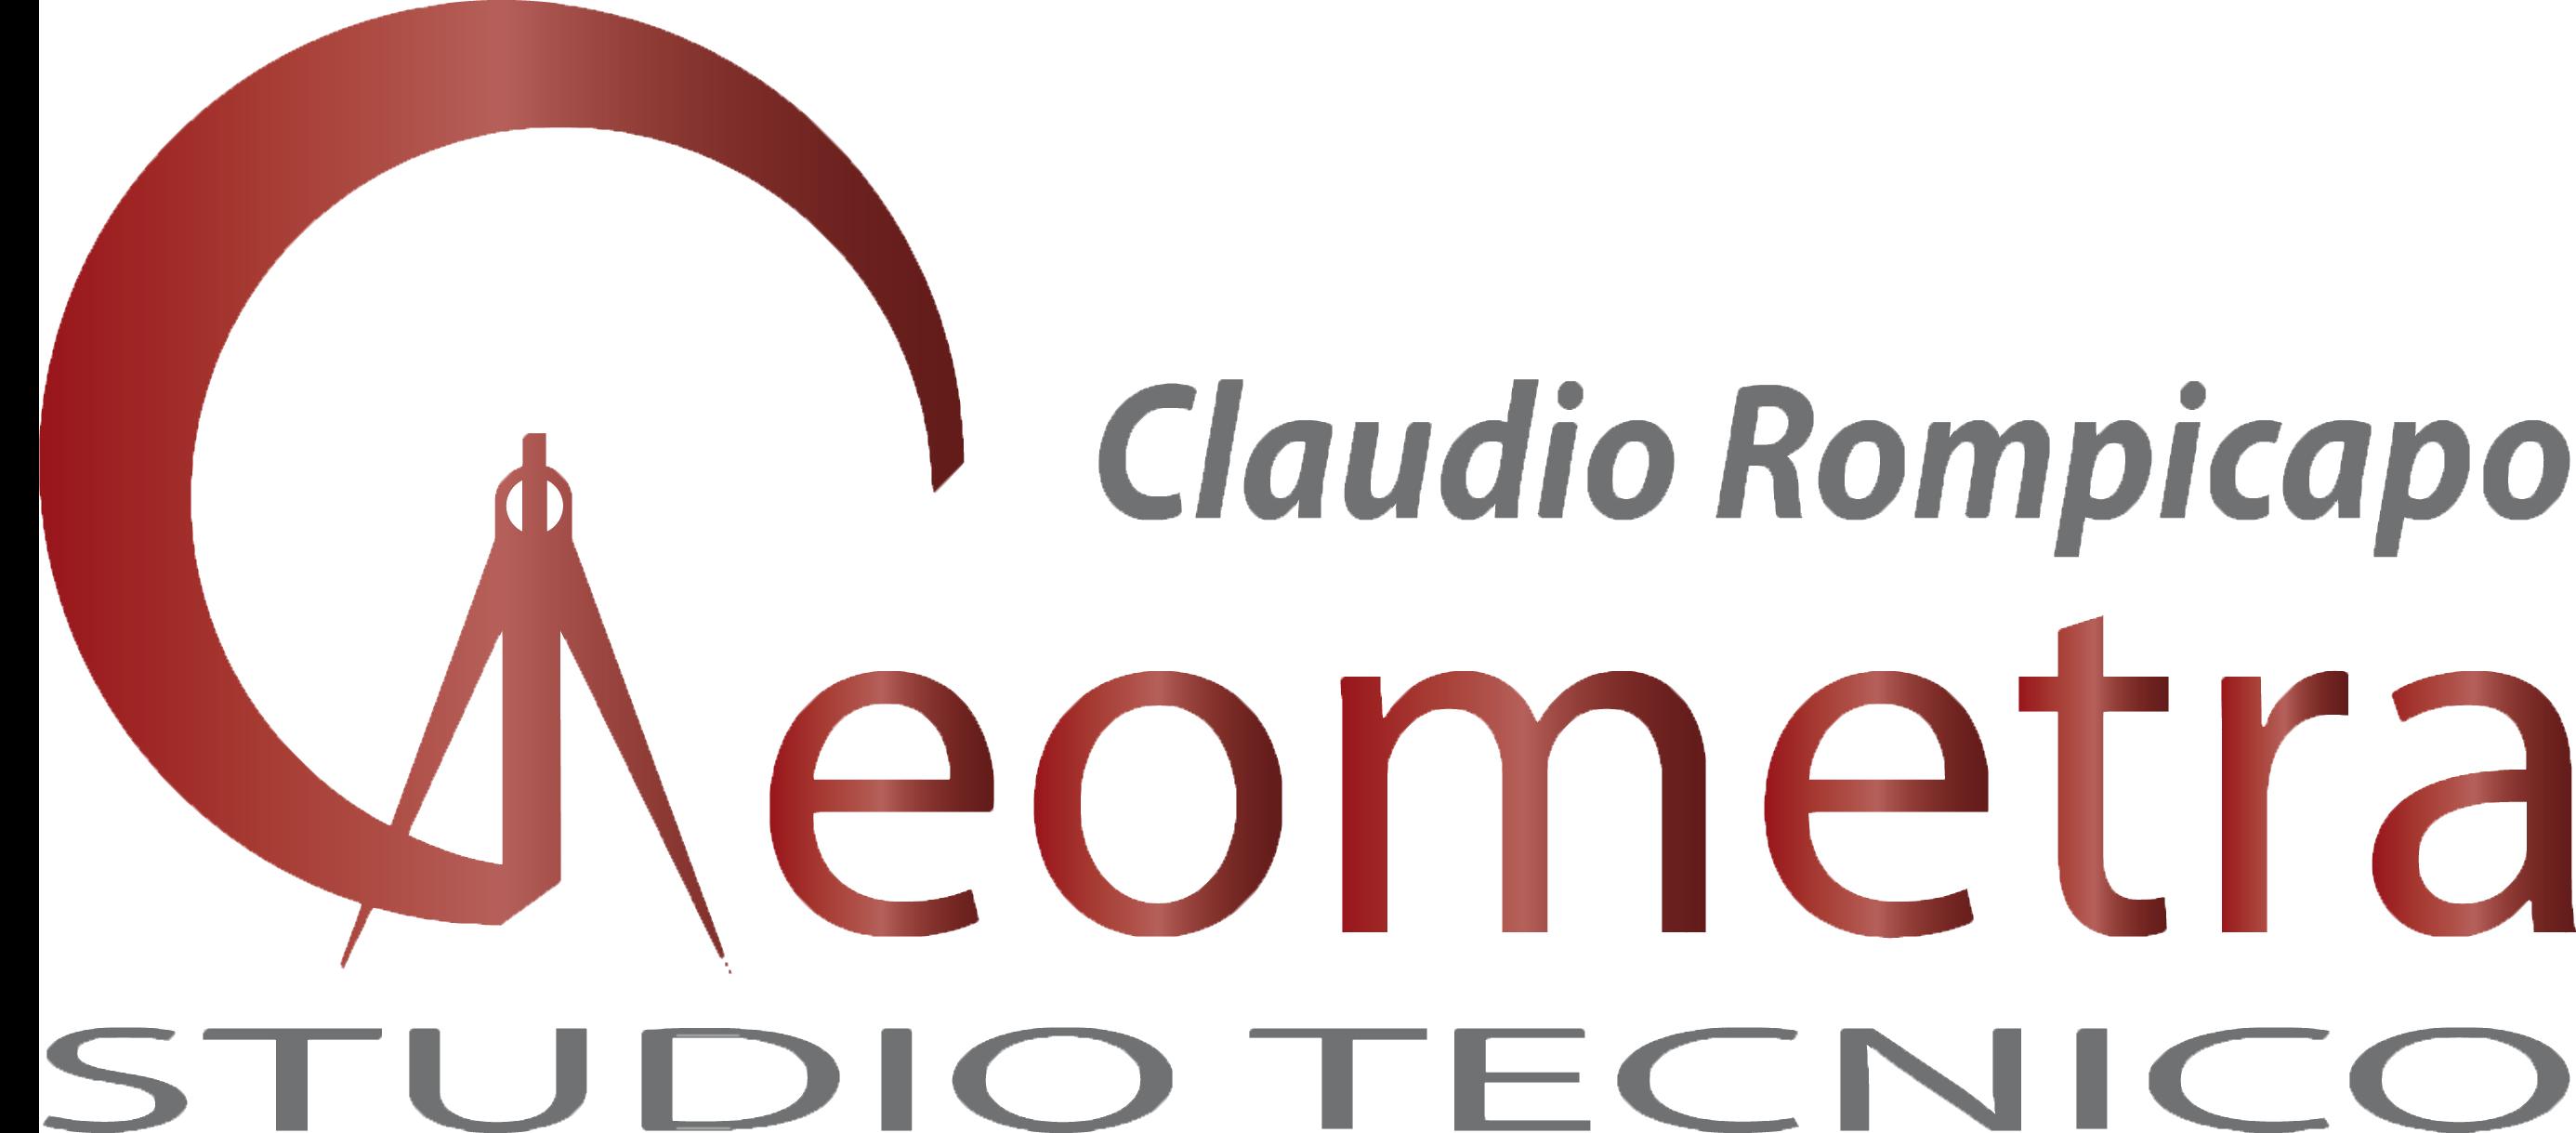 Studio Tecnico Rompicapo